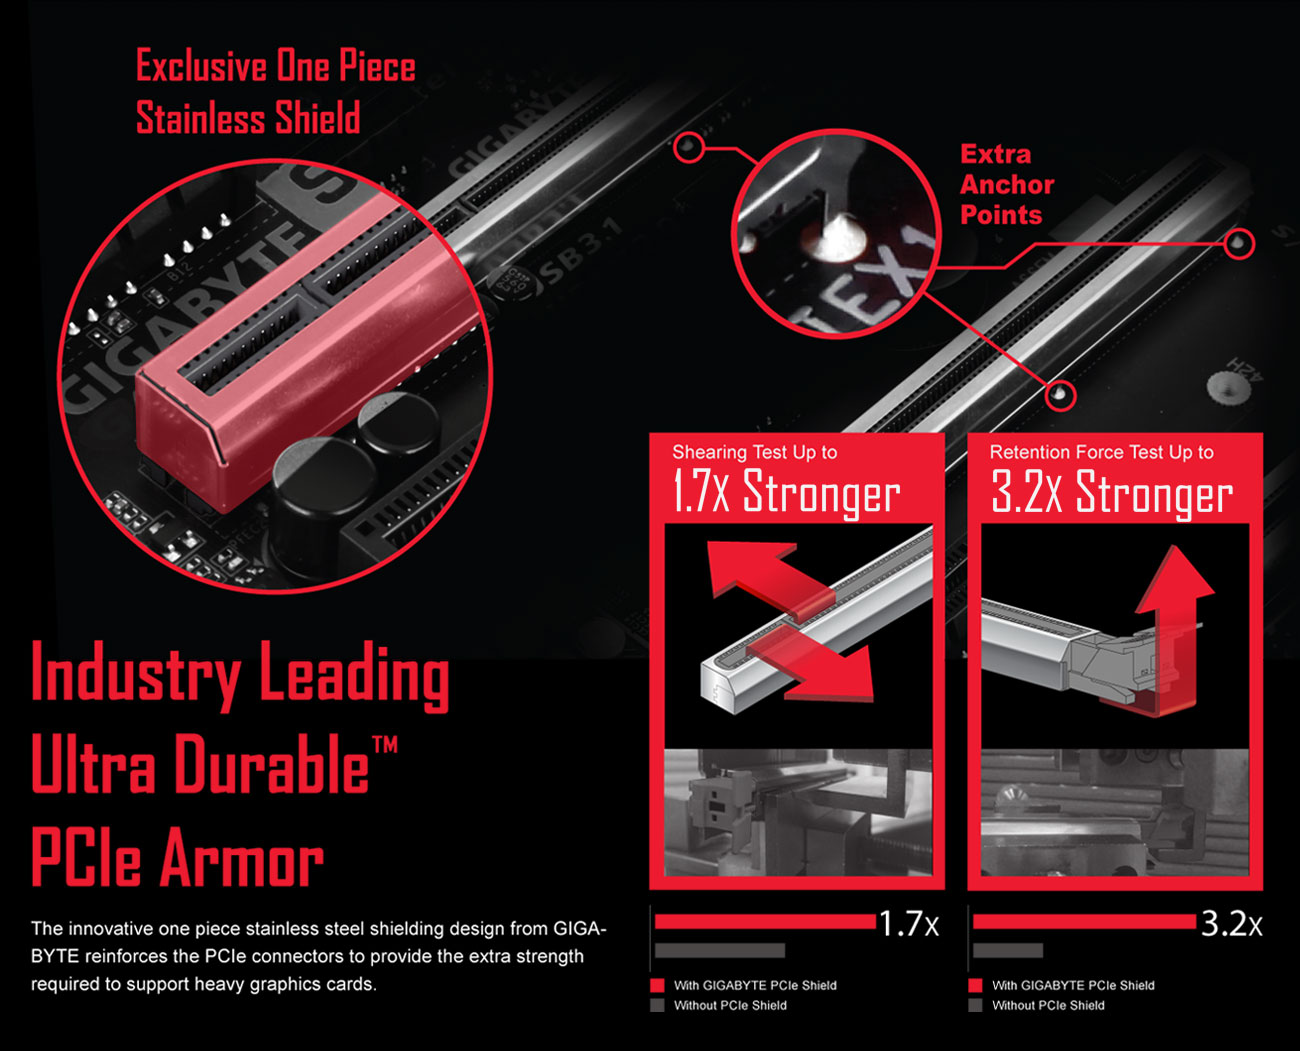 GA-AB350-Gaming 3 (rev  1 x)   Motherboard - GIGABYTE U S A